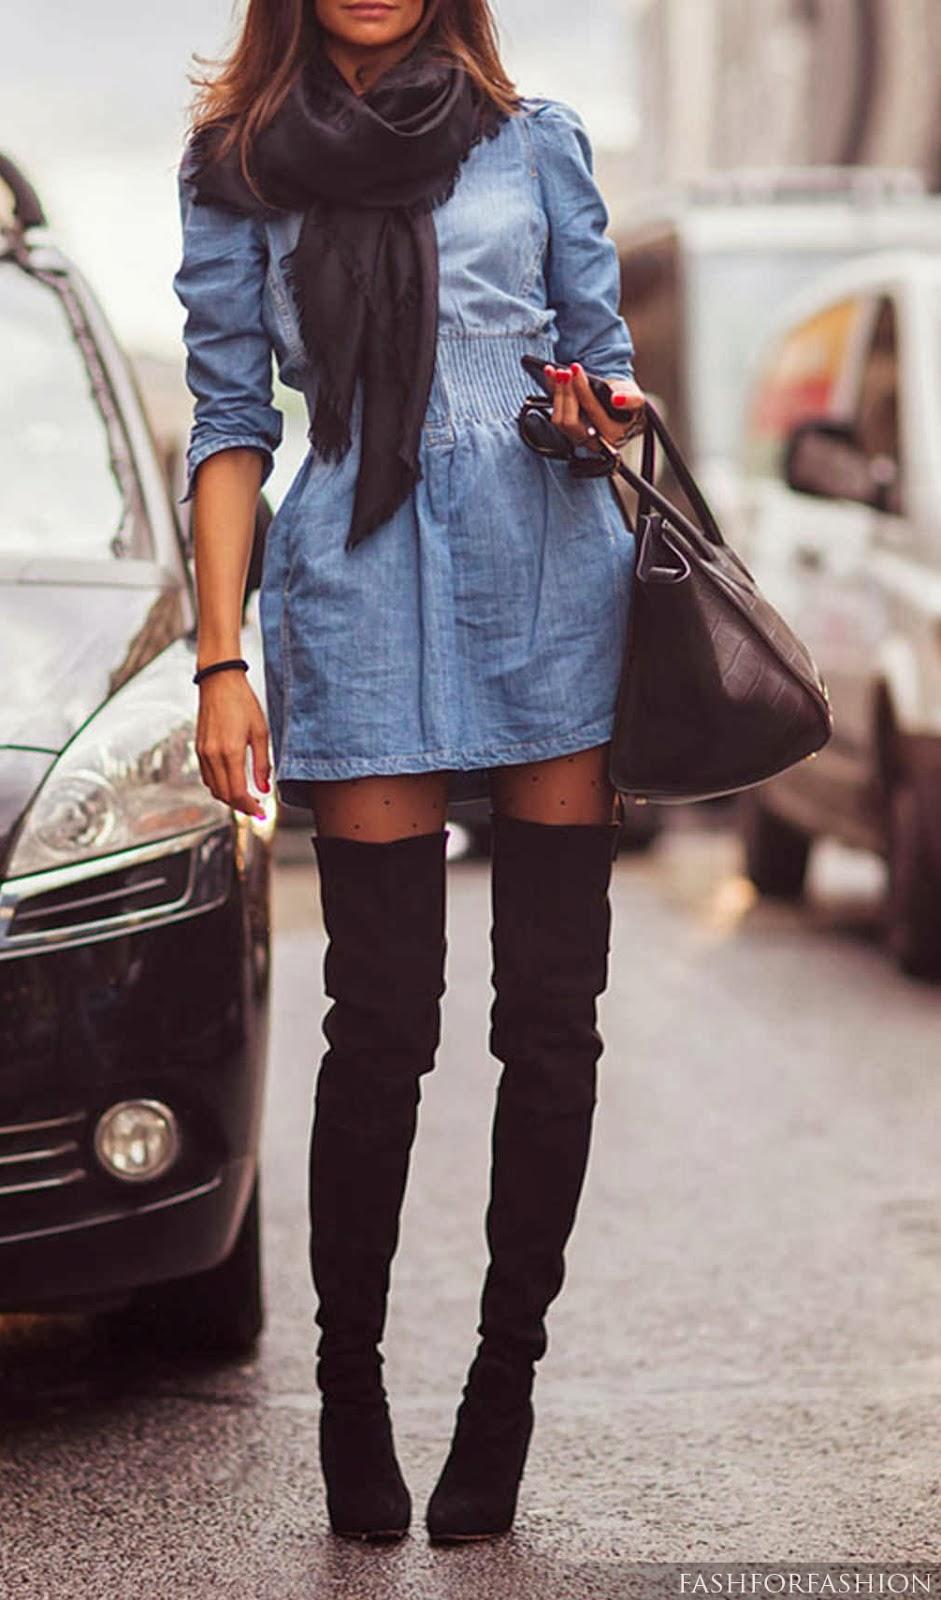 Scarf, denim dress, leggings and handbag